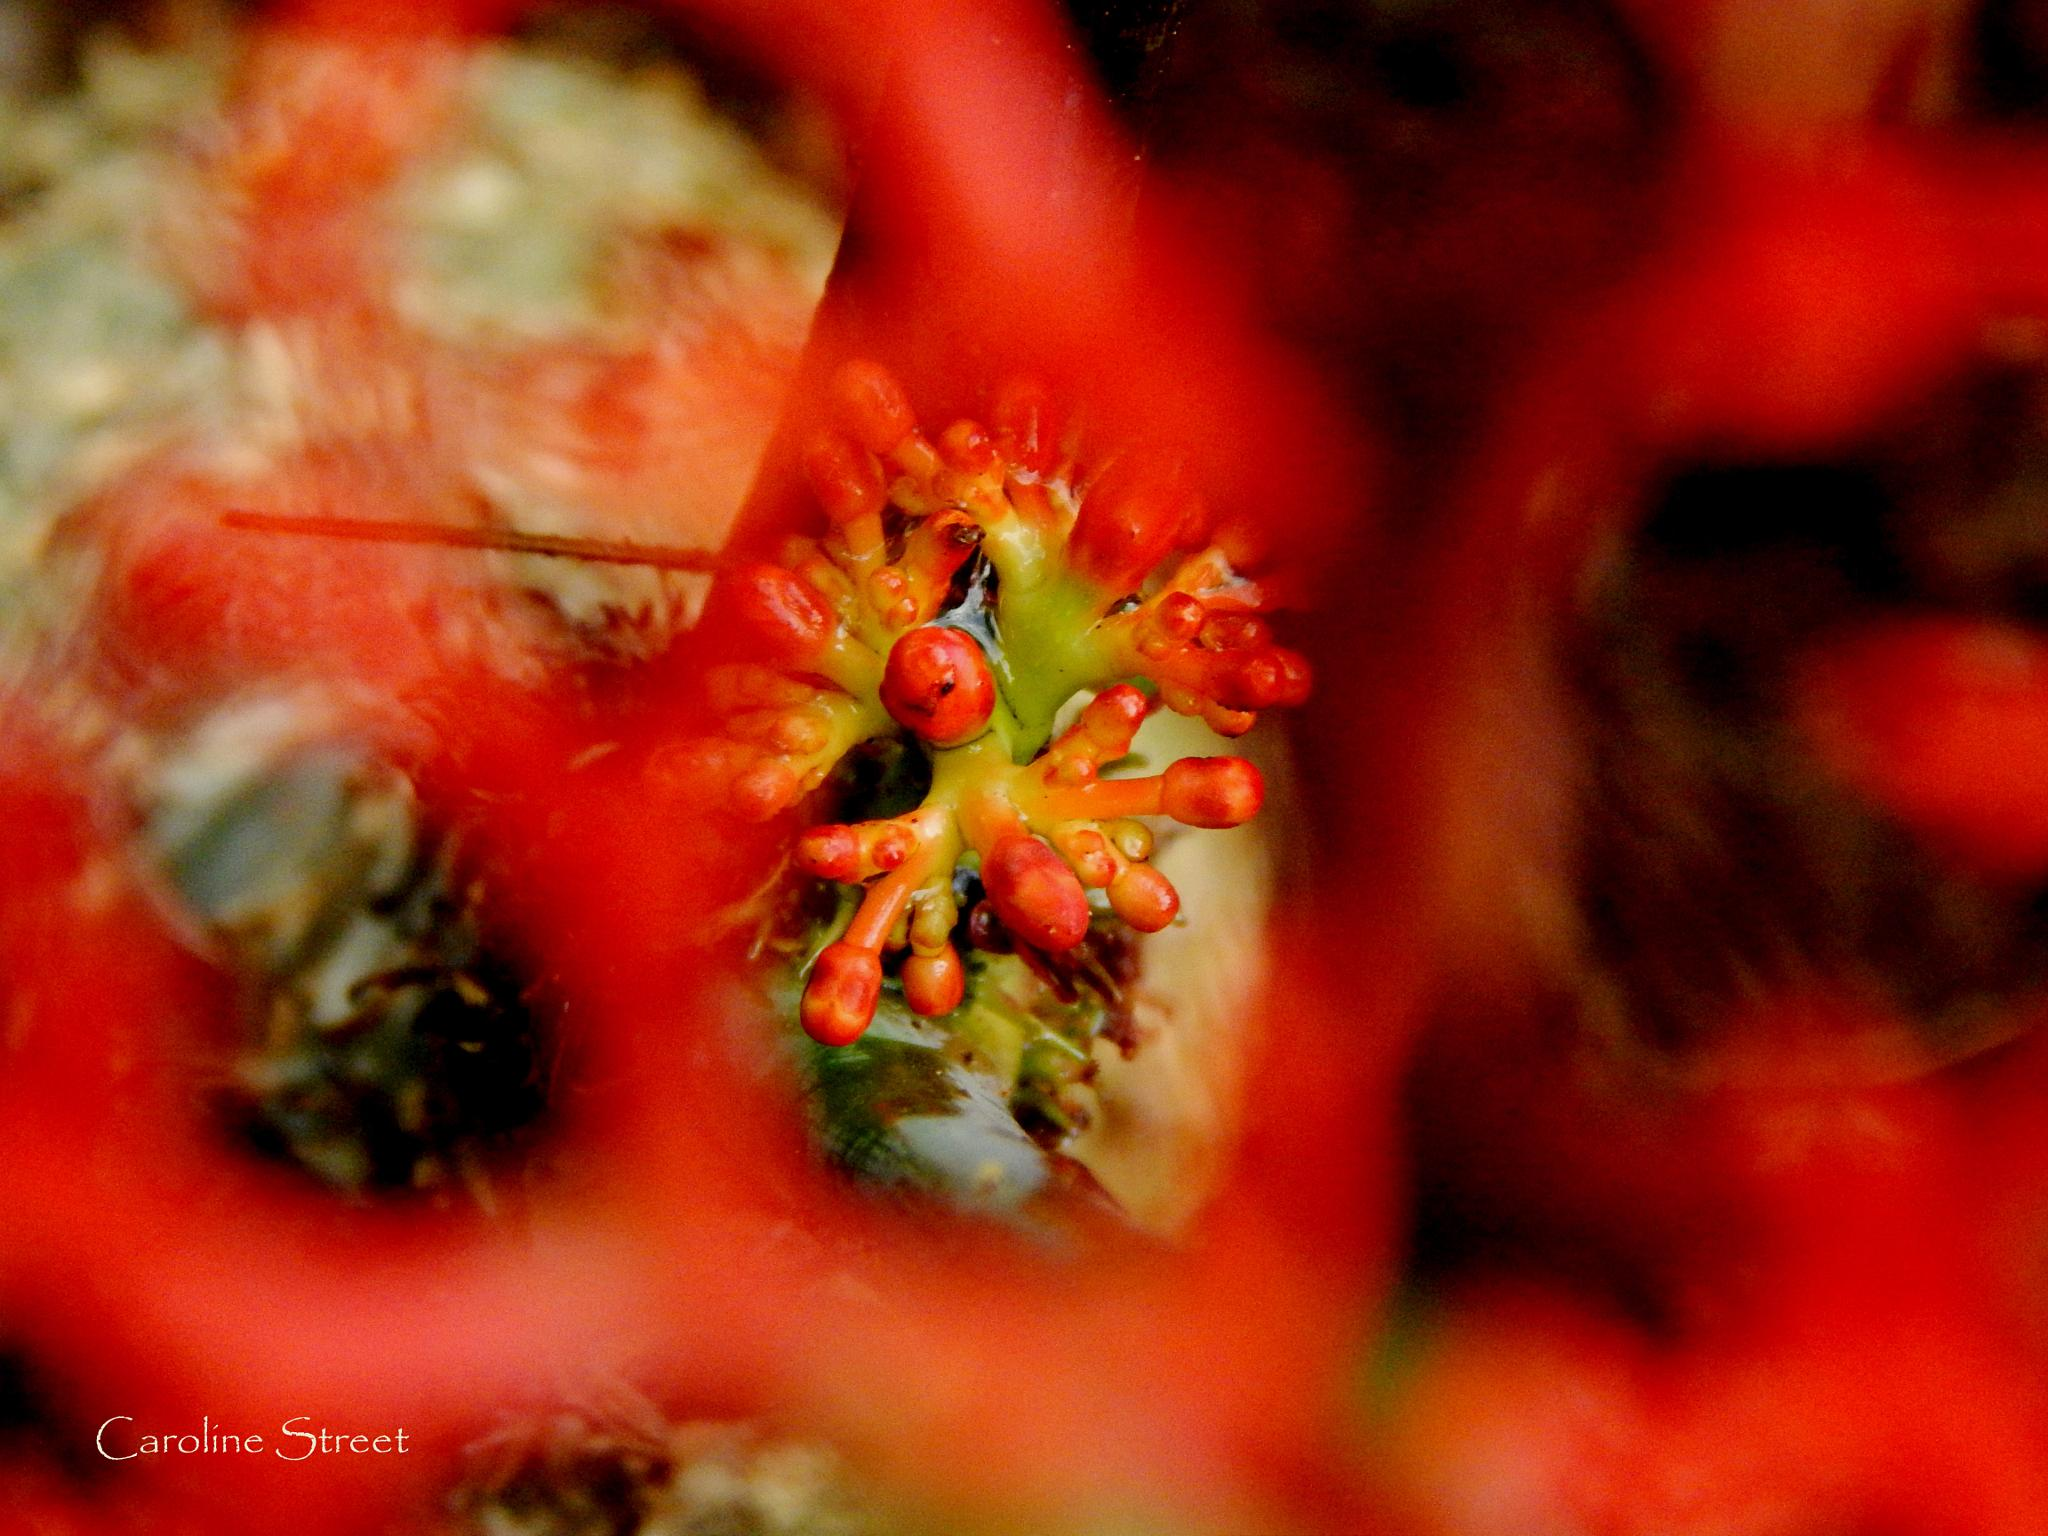 Coral Plant Buds by Caroline Street